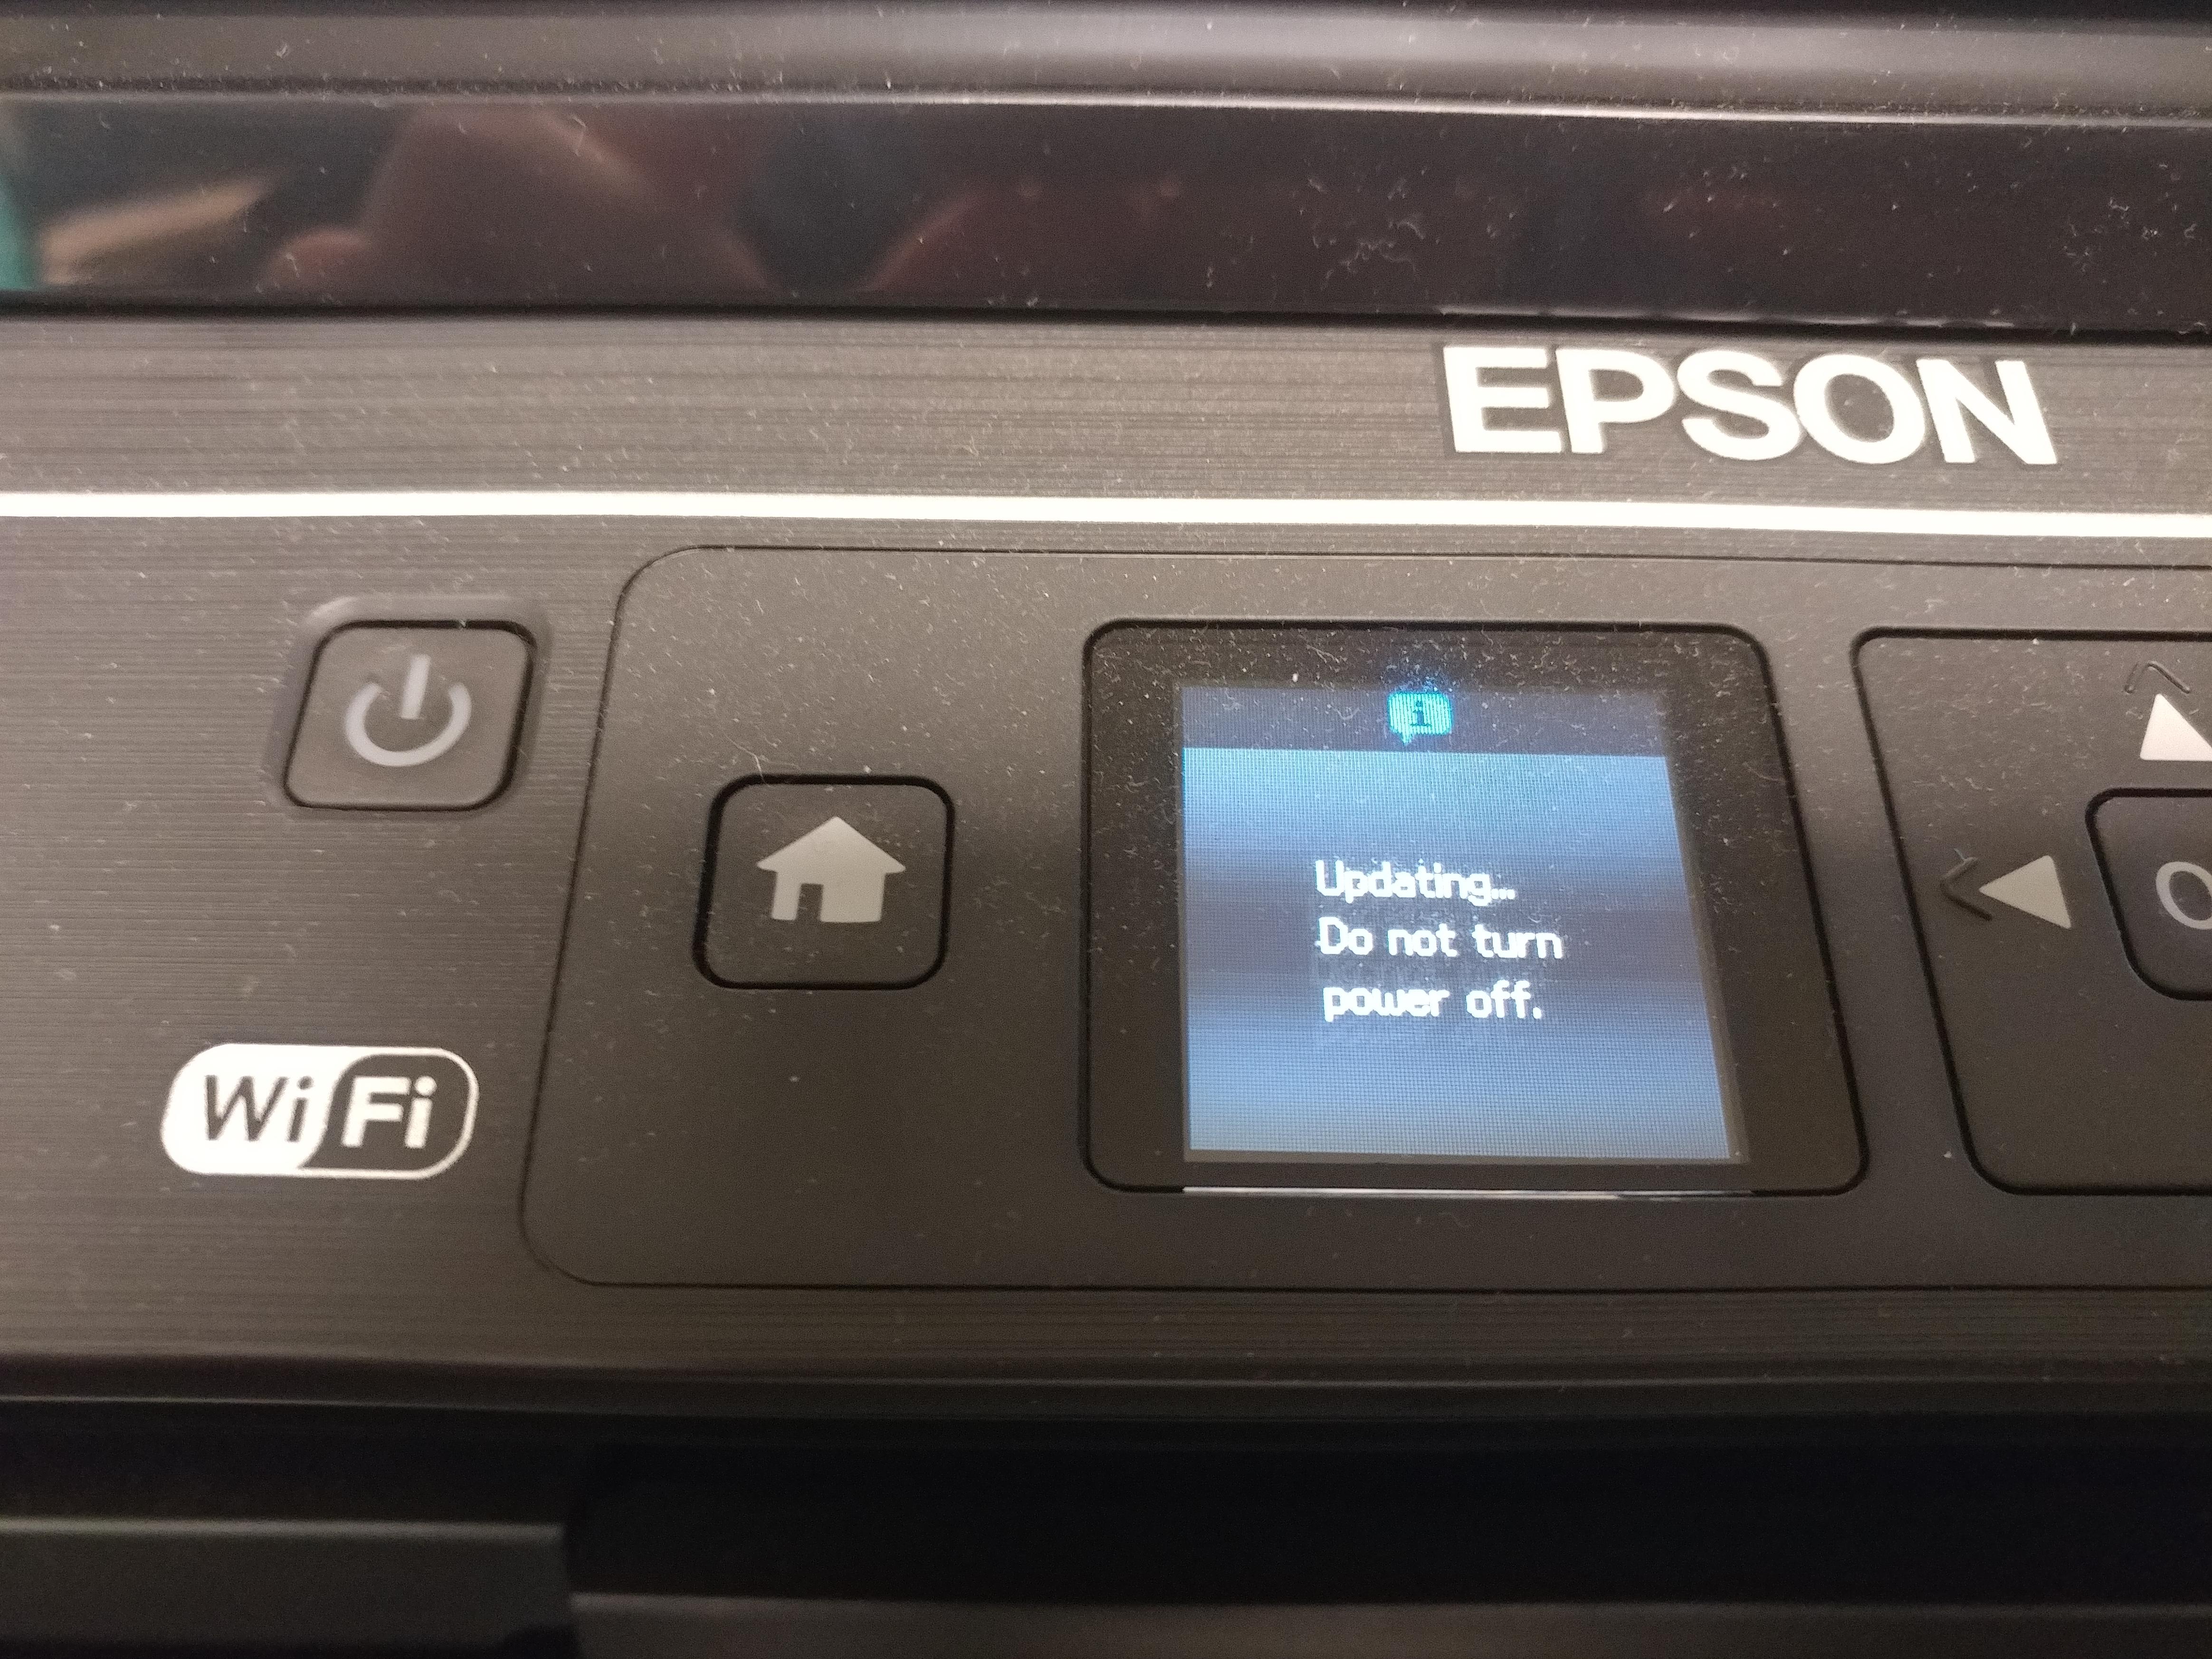 updating Espon printer firmware